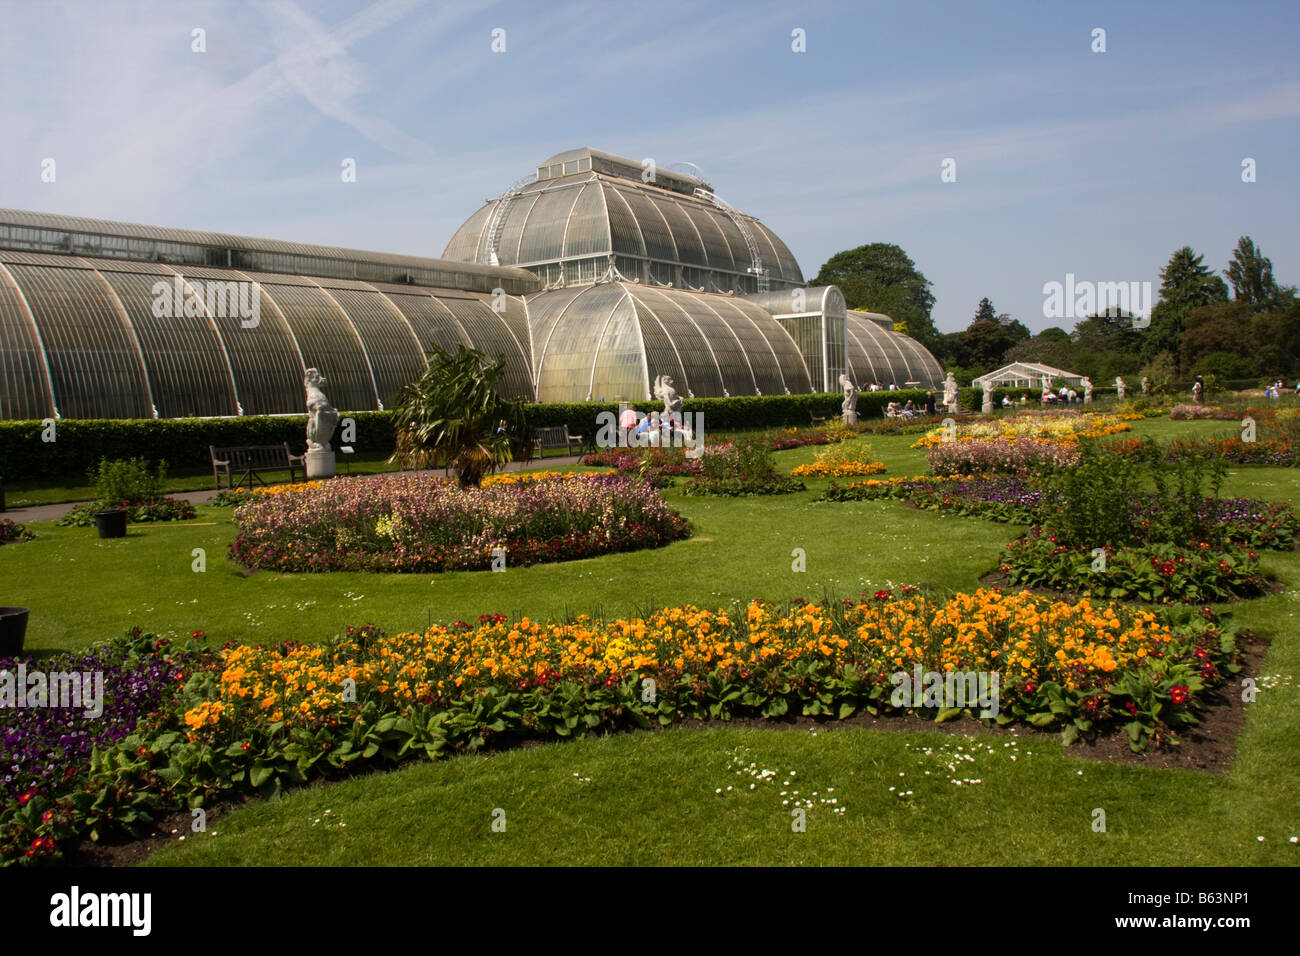 Palm House Kew Gardens London Stock Photos & Palm House Kew Gardens ...